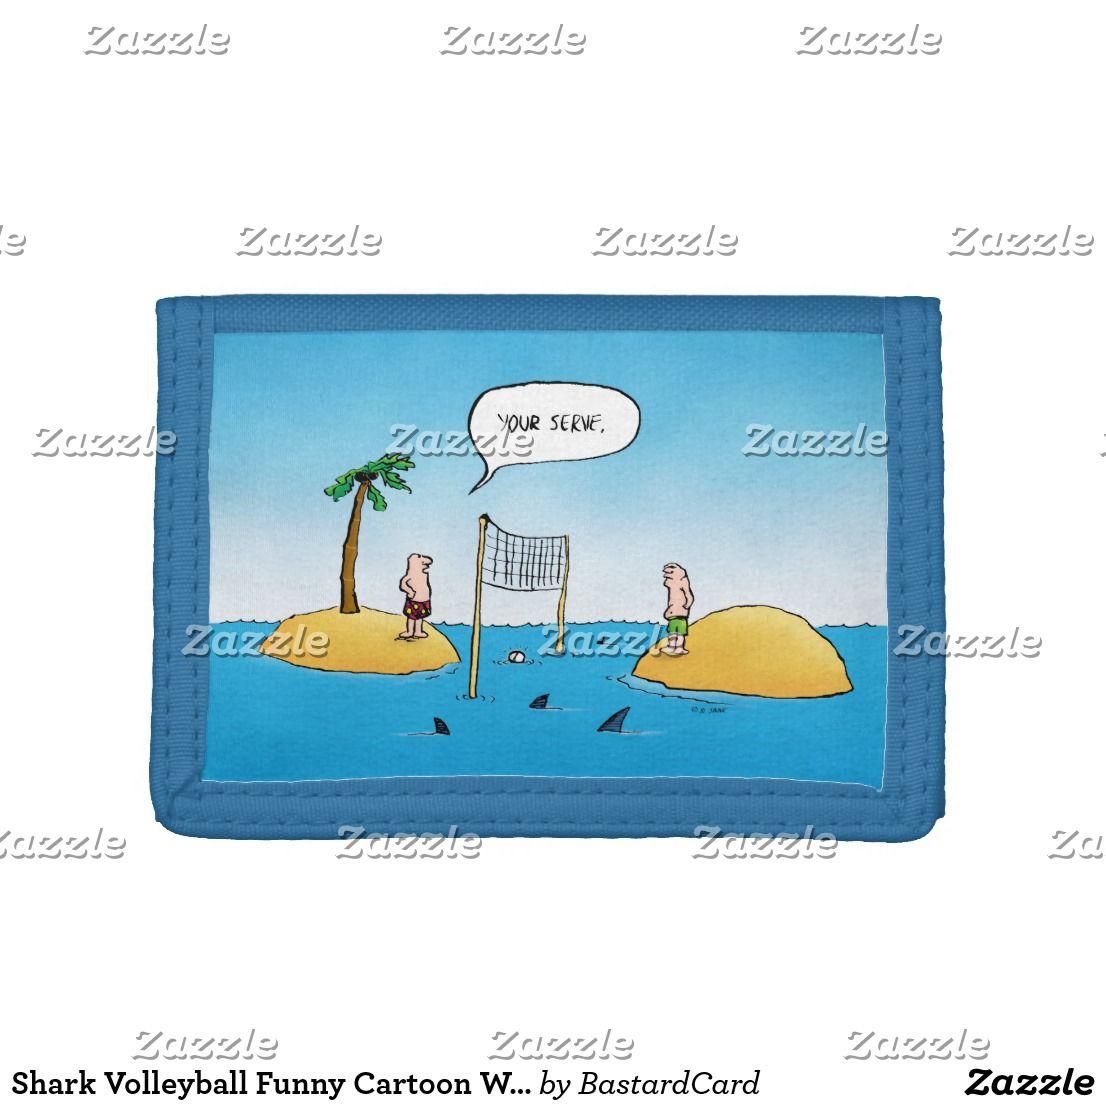 Shark Volleyball Funny Cartoon Wallet Zazzle Com With Images Funny Cartoon Volleyball Humor Funny